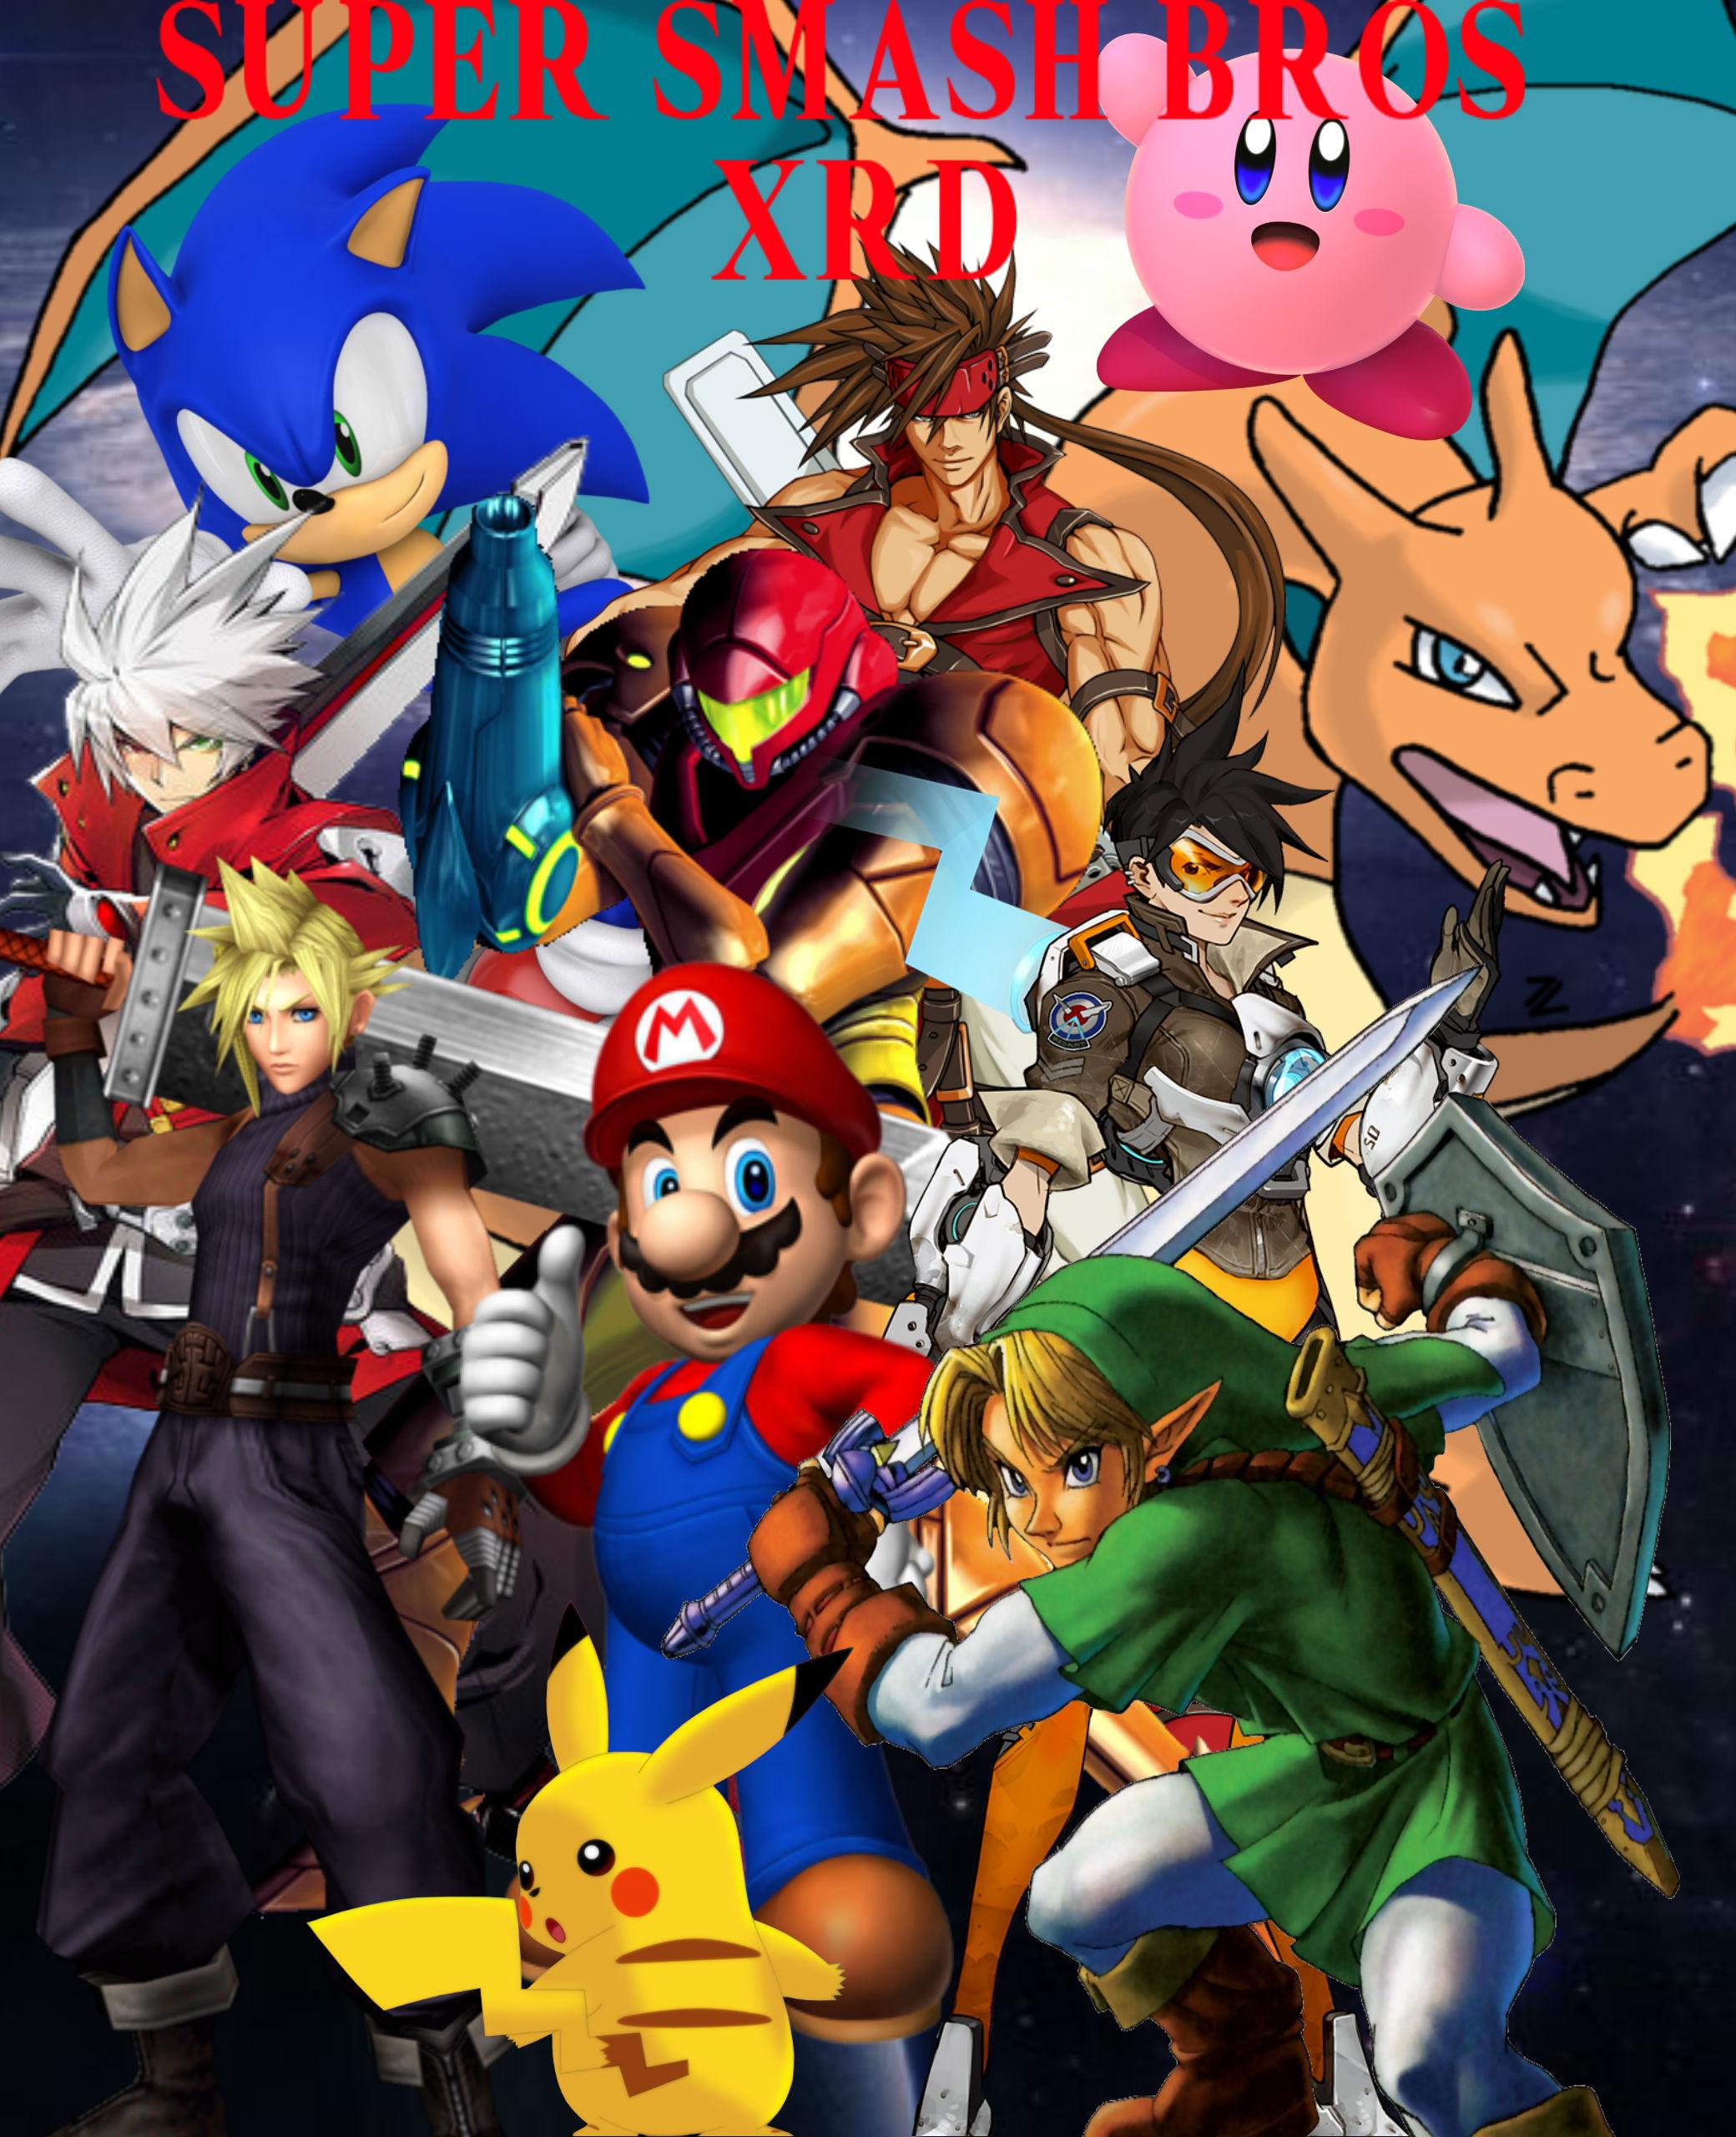 Super Smash Bros XRD